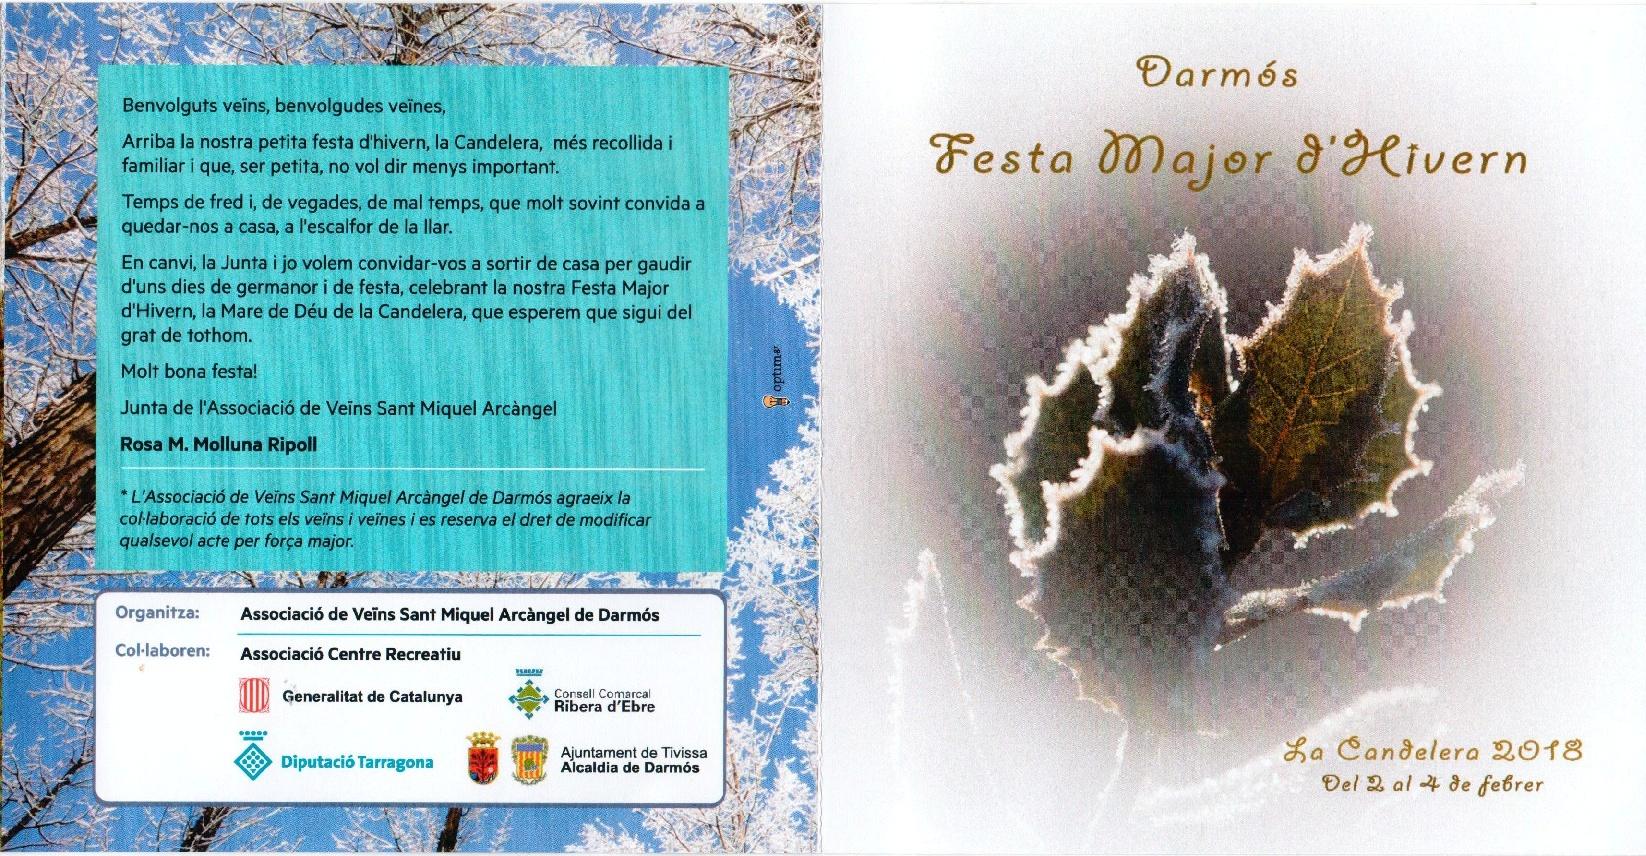 Festa de la Candelera a Darmós